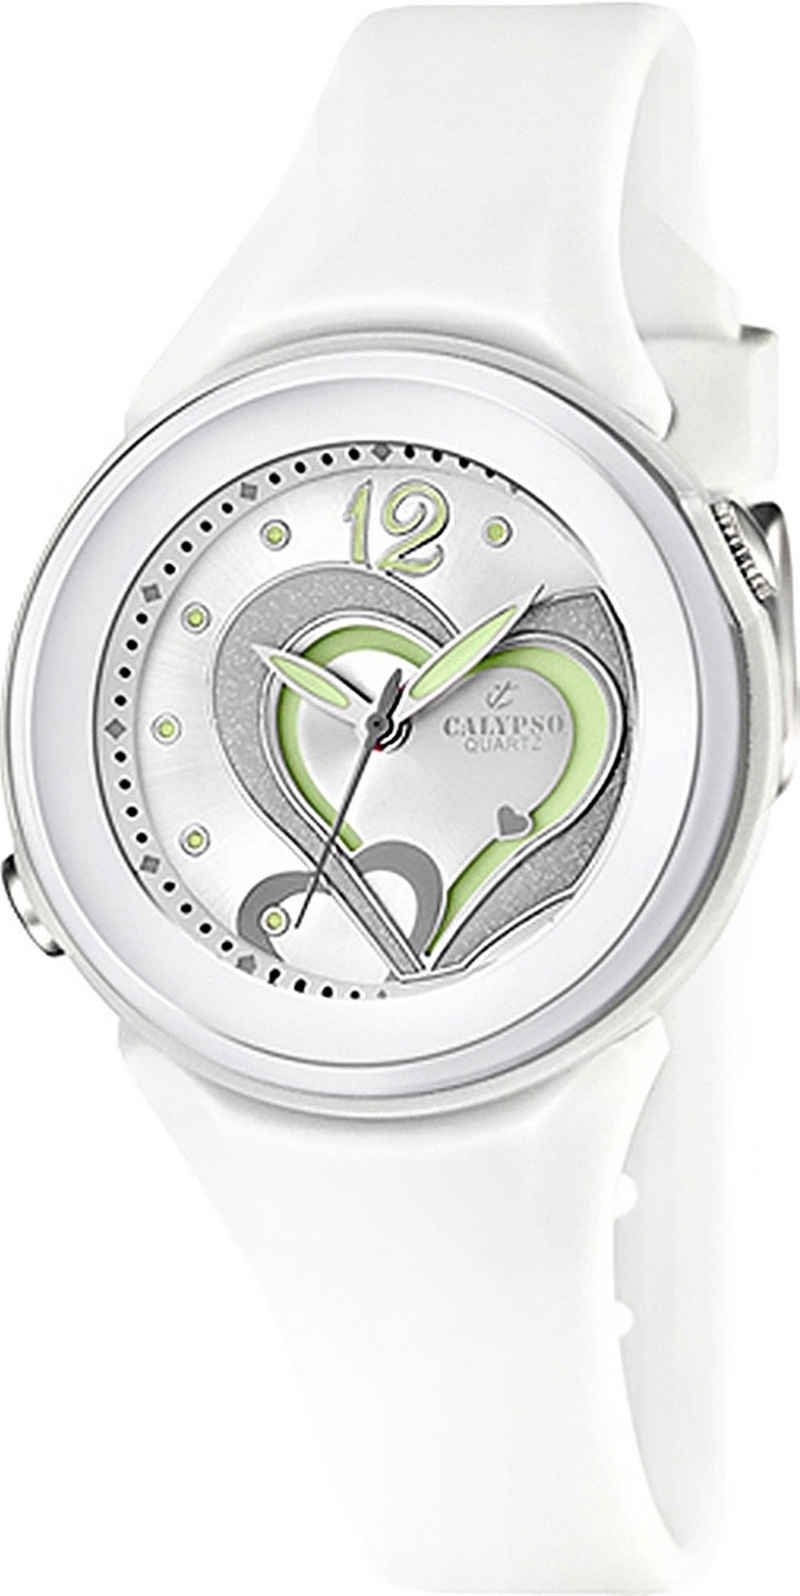 CALYPSO WATCHES Quarzuhr »UK5576/1 Calypso Damen Uhr K5576/1Kunststoffband«, (Analoguhr), Damen Armbanduhr rund, PURarmband weiß, Fashion